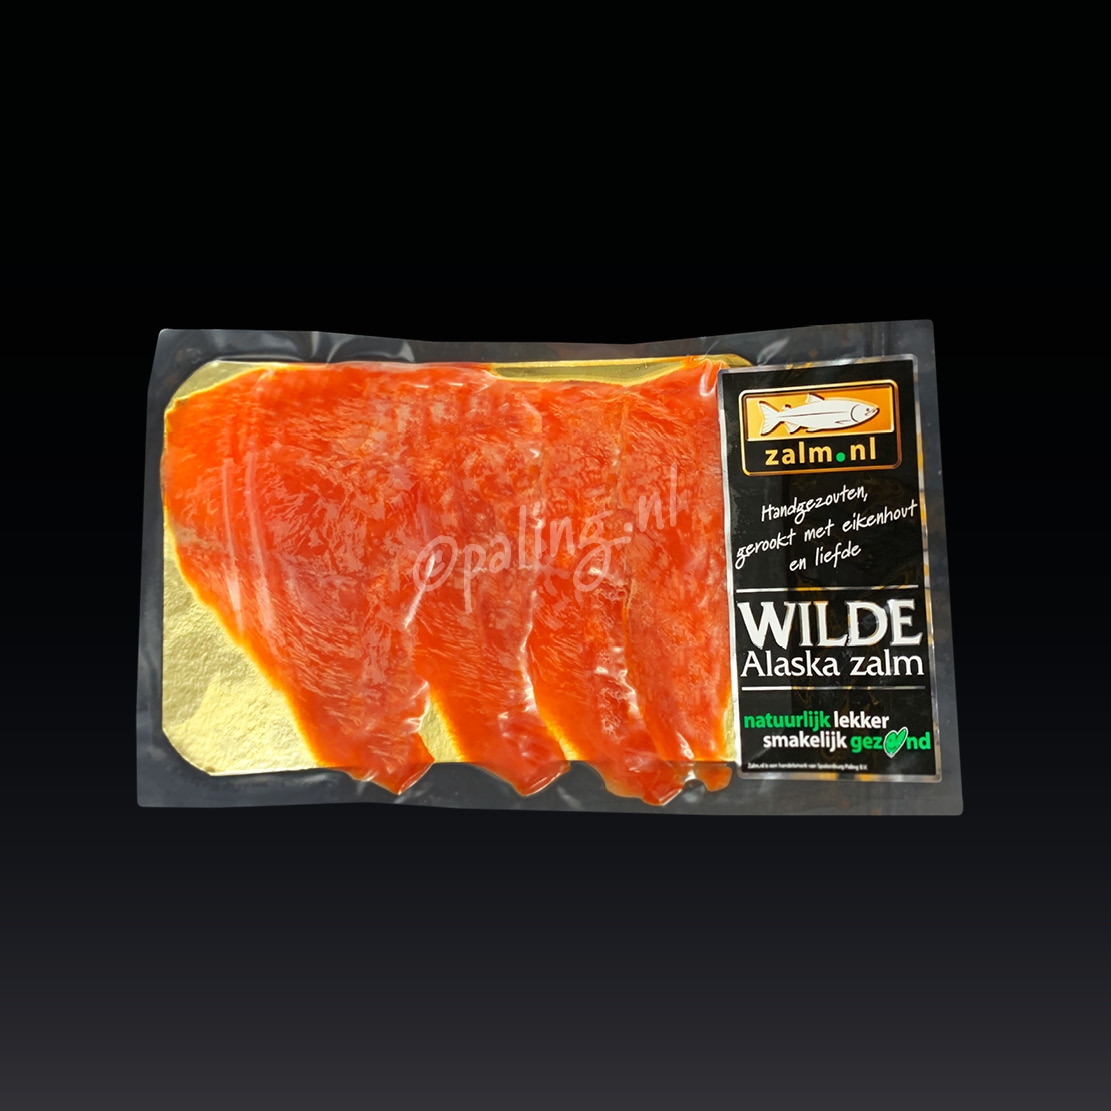 Wilde Alaska zalm 100 gram